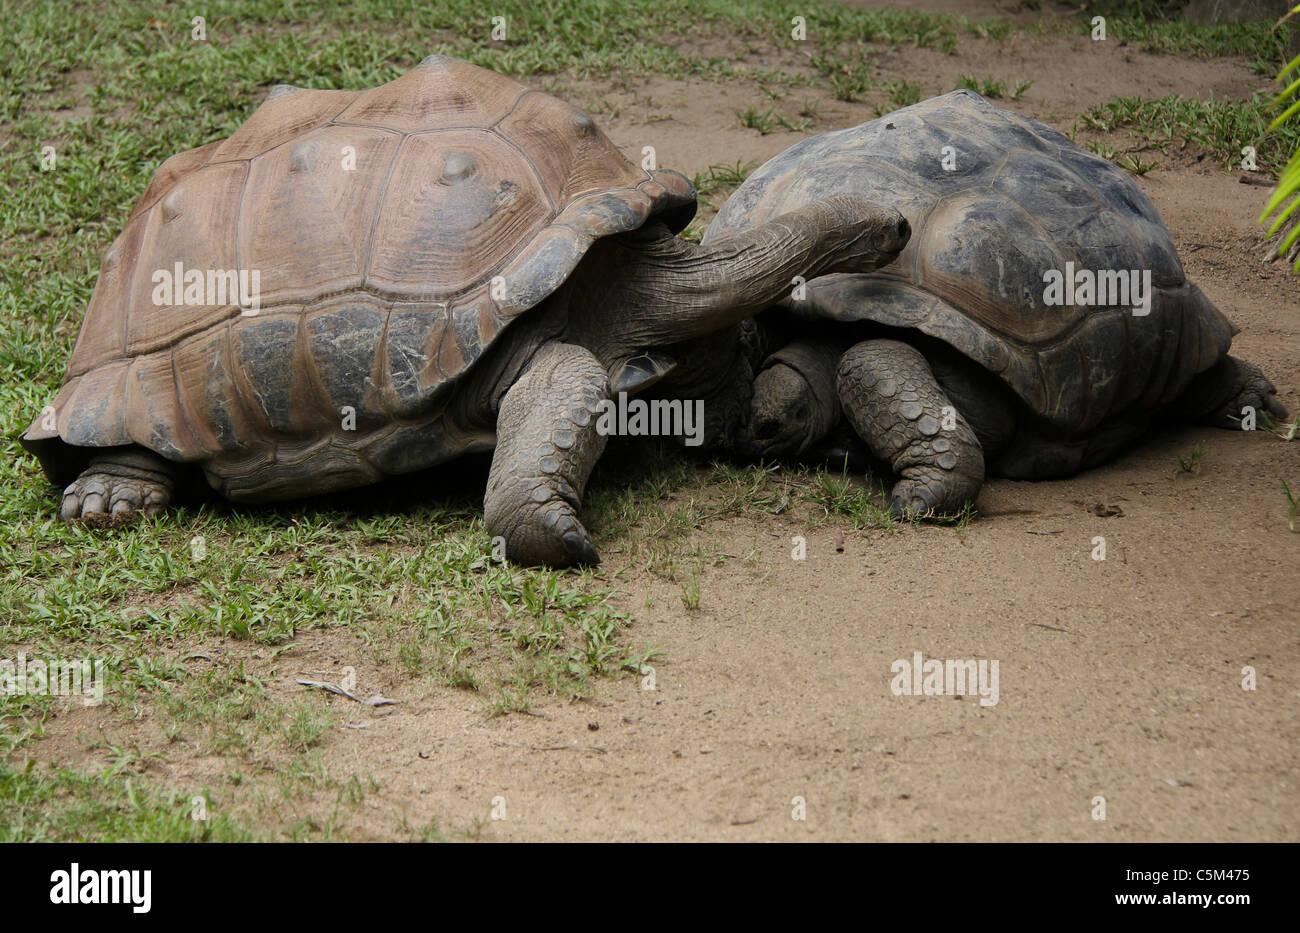 Giant turtles - Stock Image